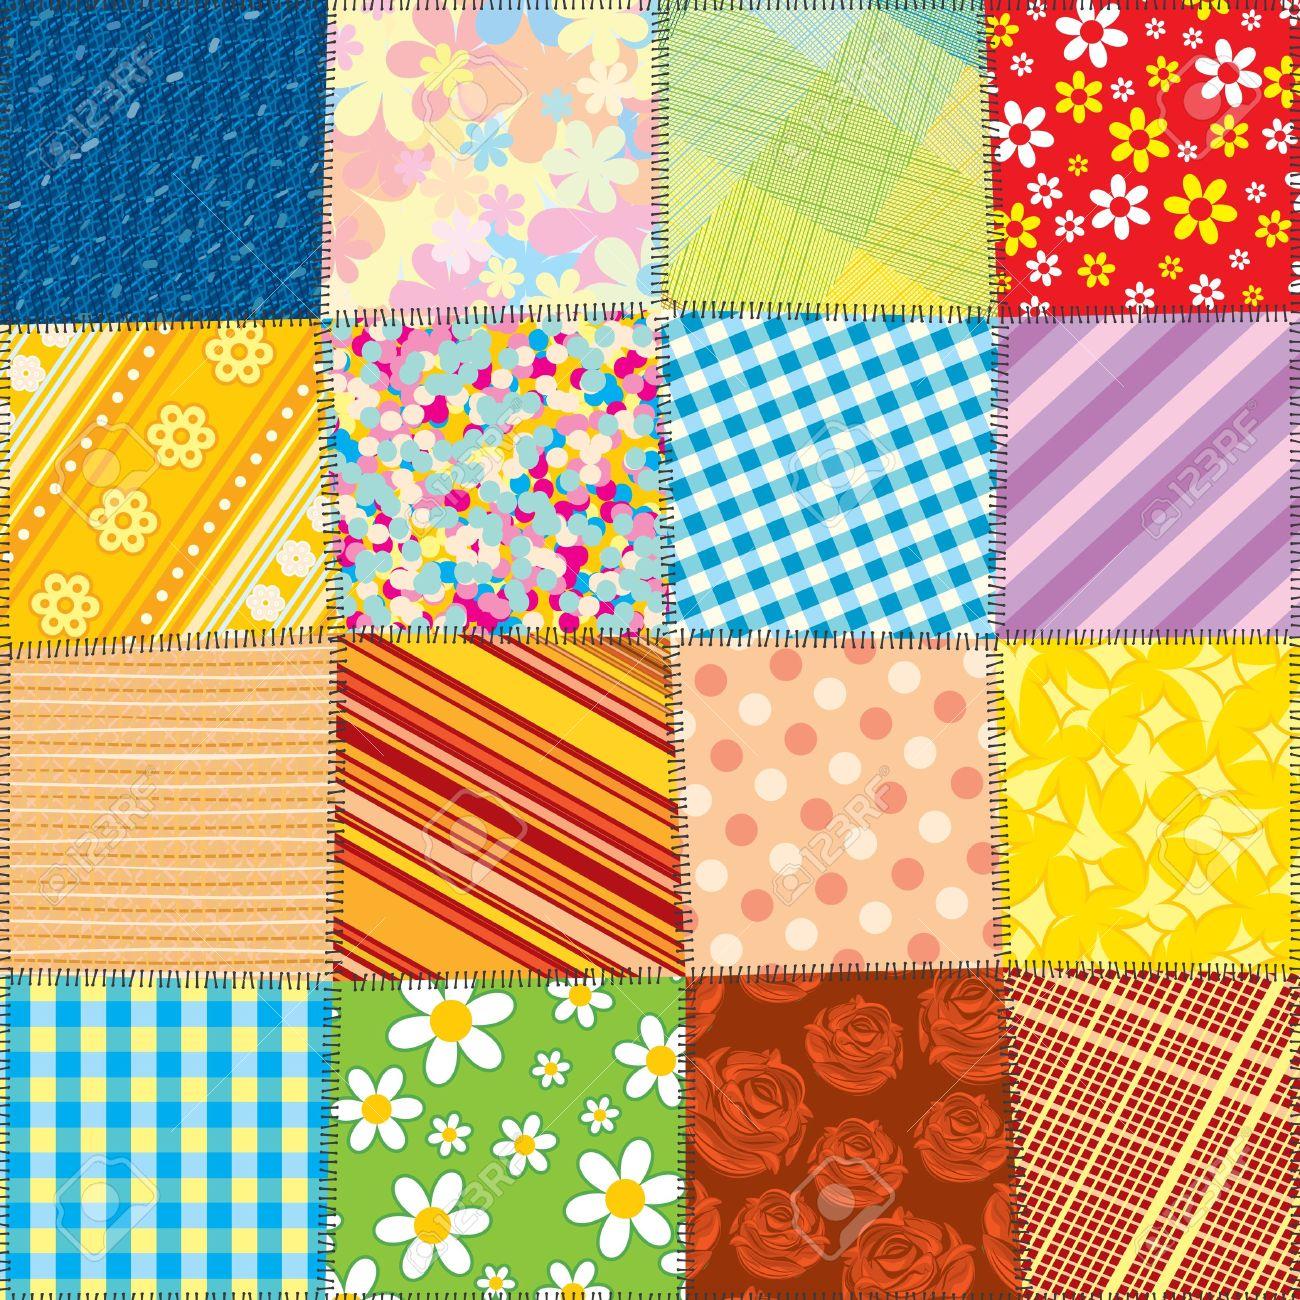 Quilt Patchwork Texture .-Quilt Patchwork Texture .-16